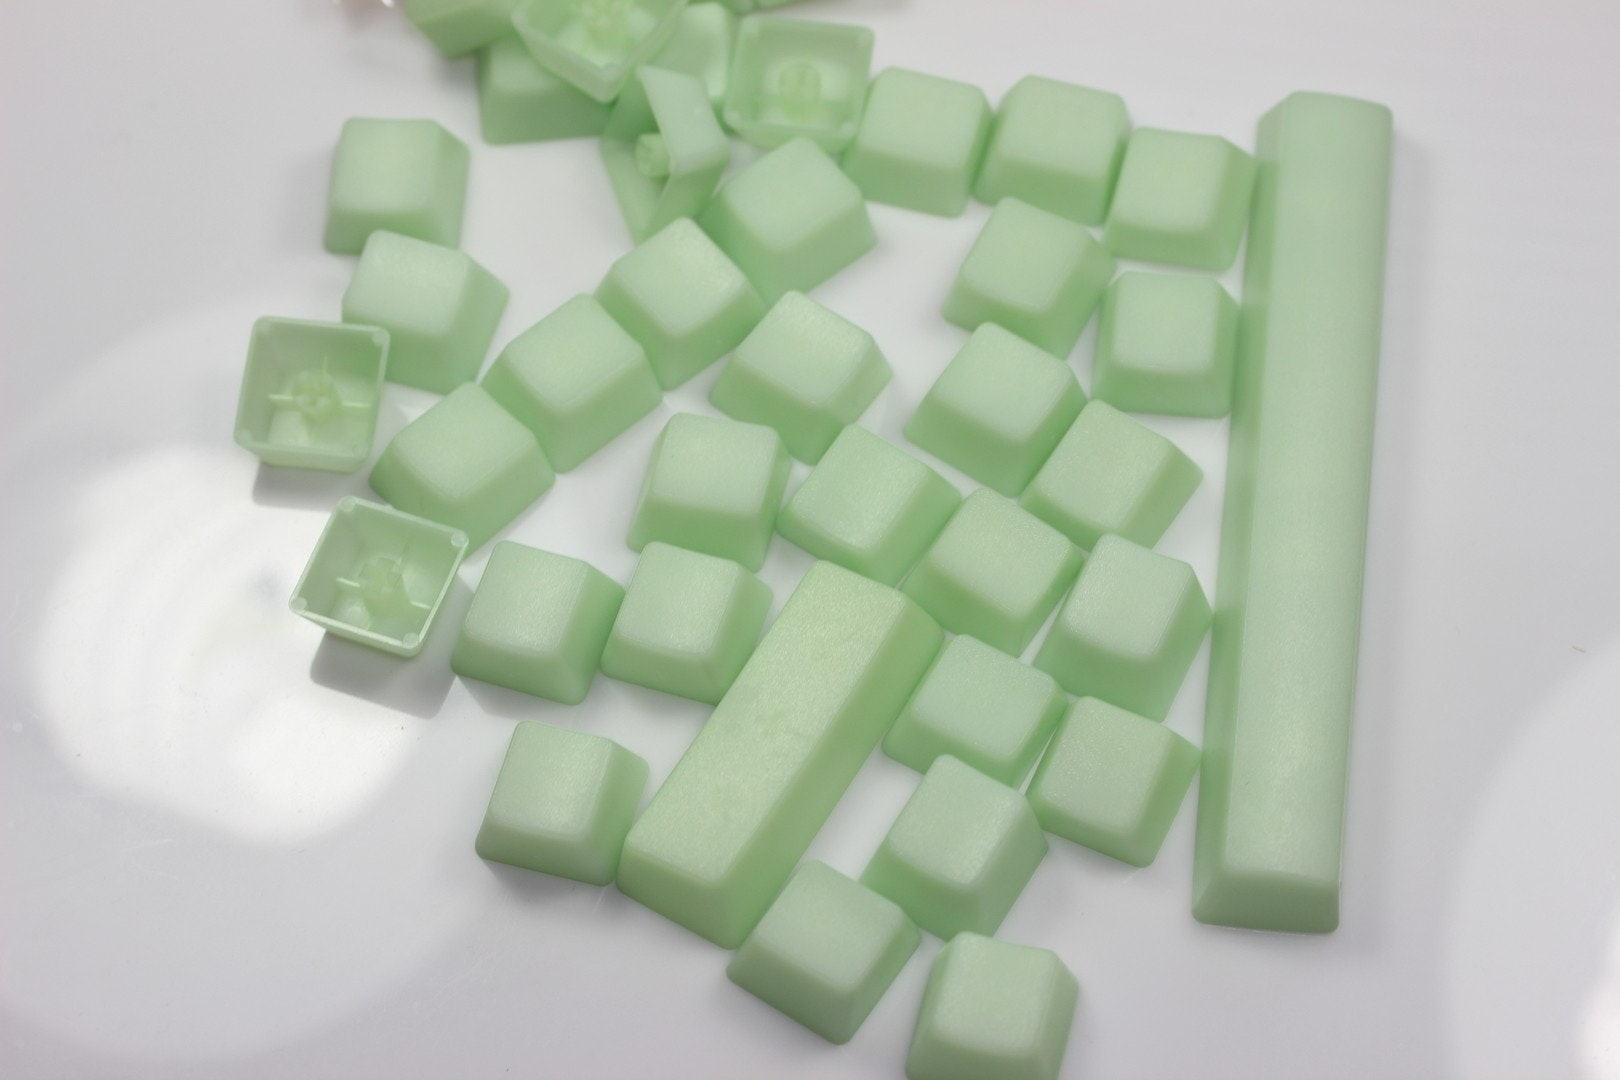 Green Jelly POM Keycap Set